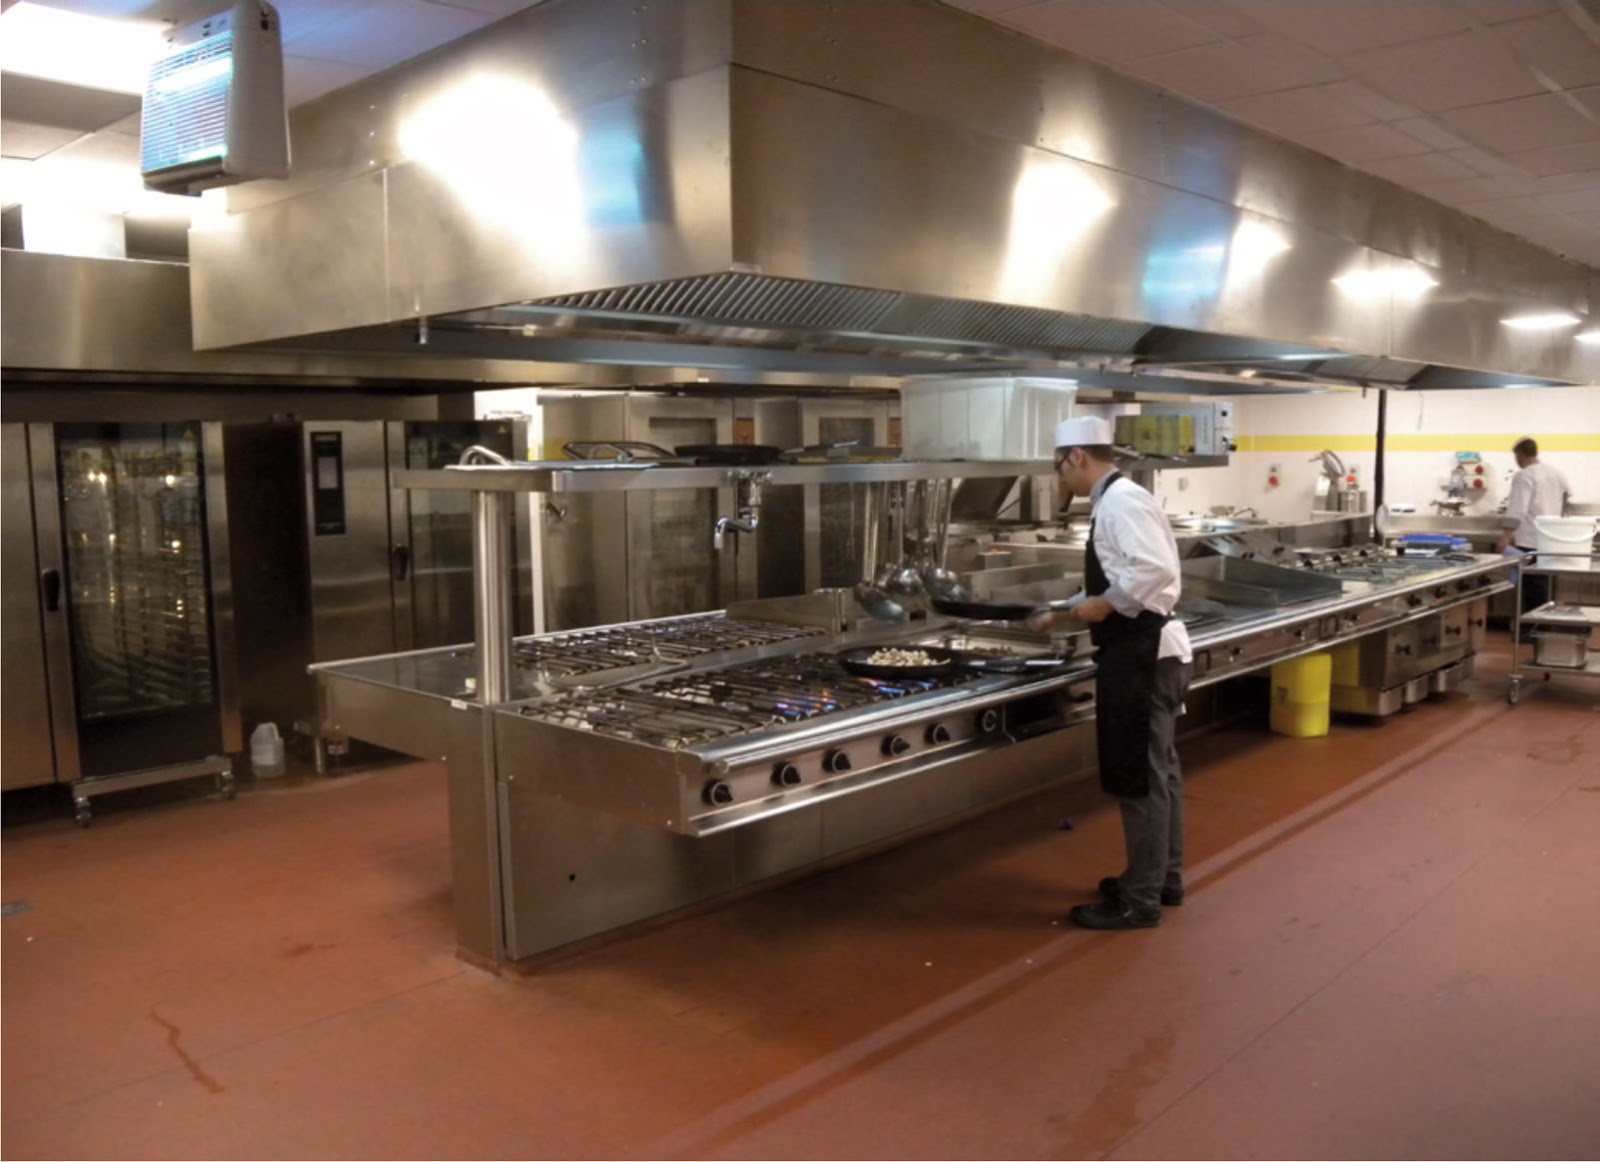 L'IGIENE nelle Cucine Industriali.  Cooking System HygienicLINE